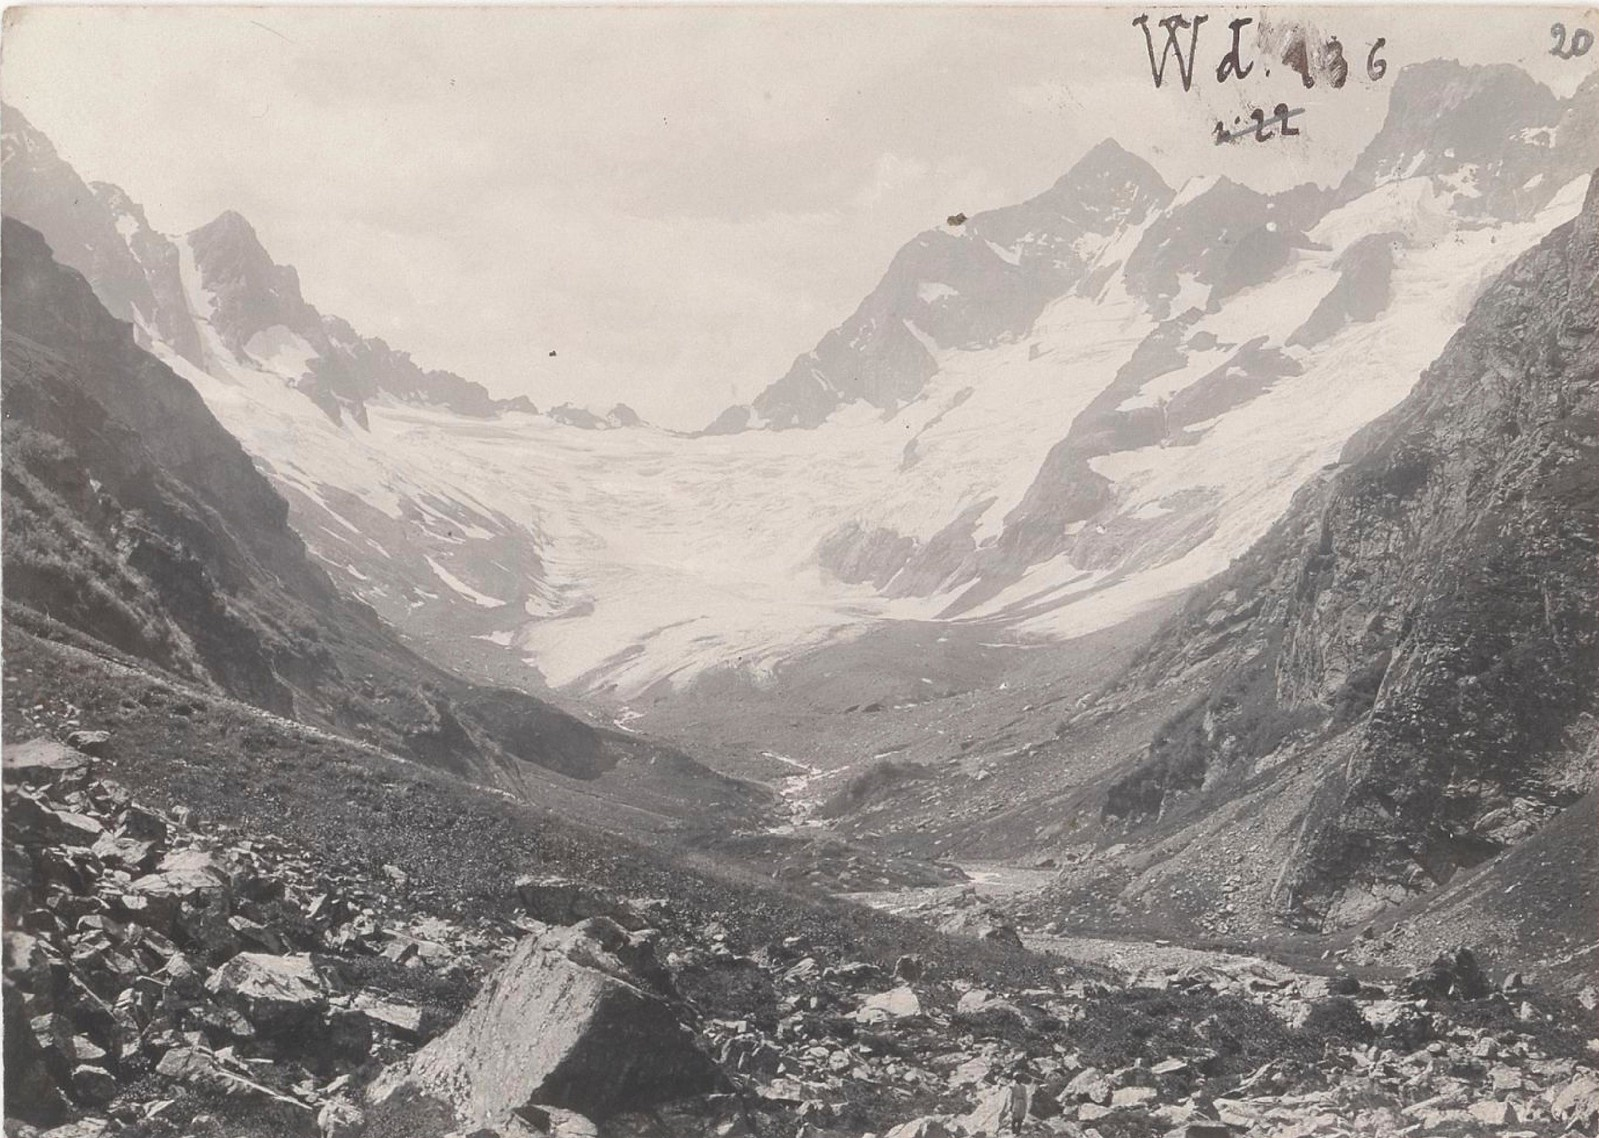 20. Западный Кавказ. Ледник Домбай-Ульген, август 1898